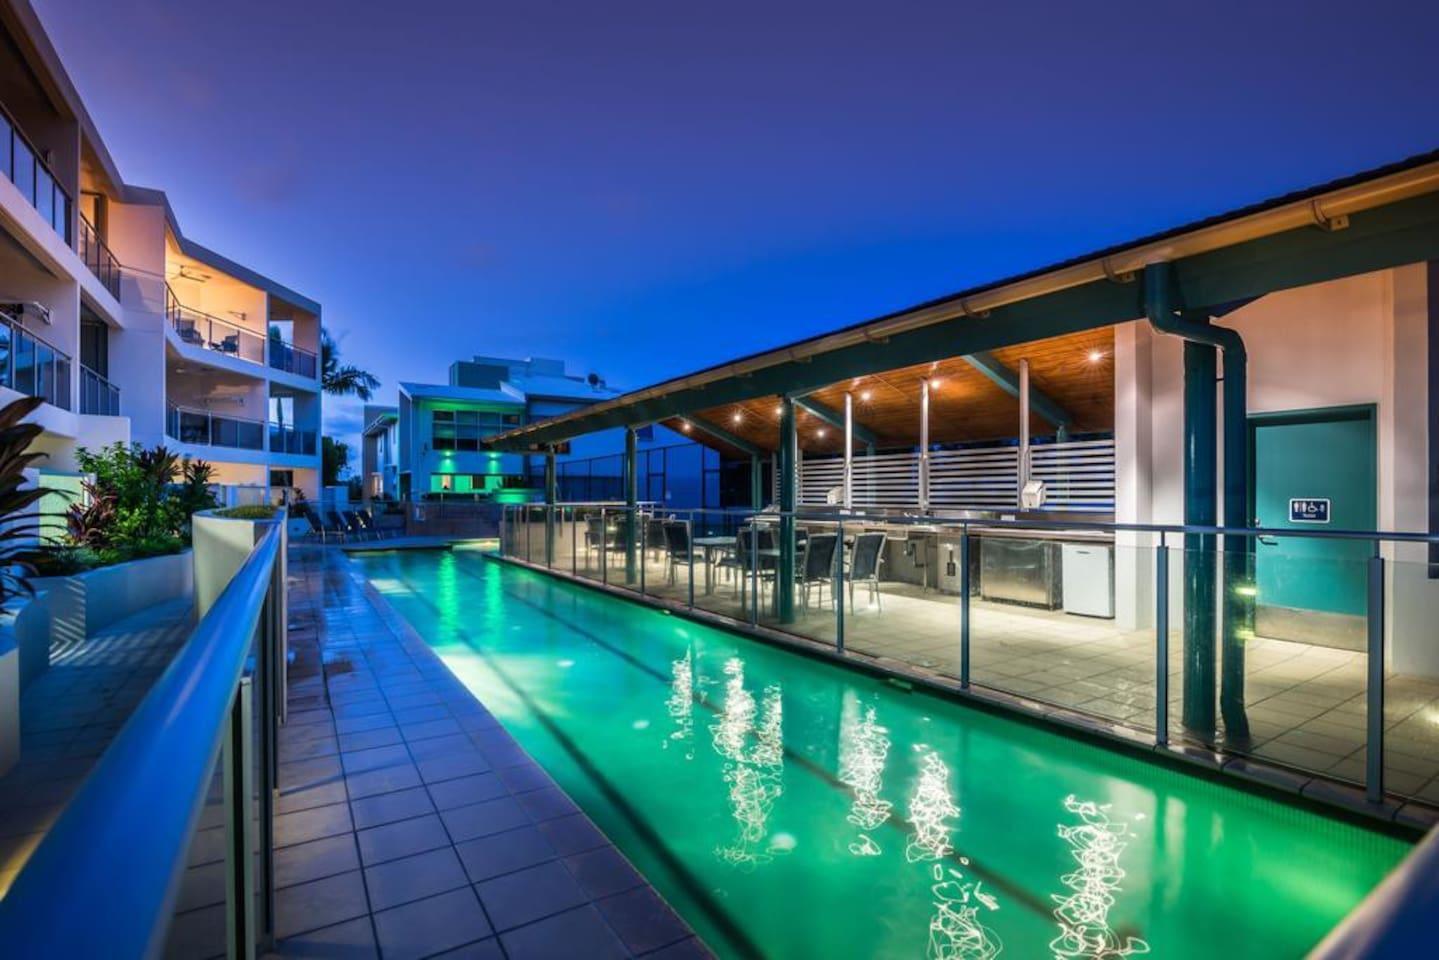 Apartment 2BR Coolum Beach    Rooftop Terrace   Spa   Tennis   Pool photo 26289856